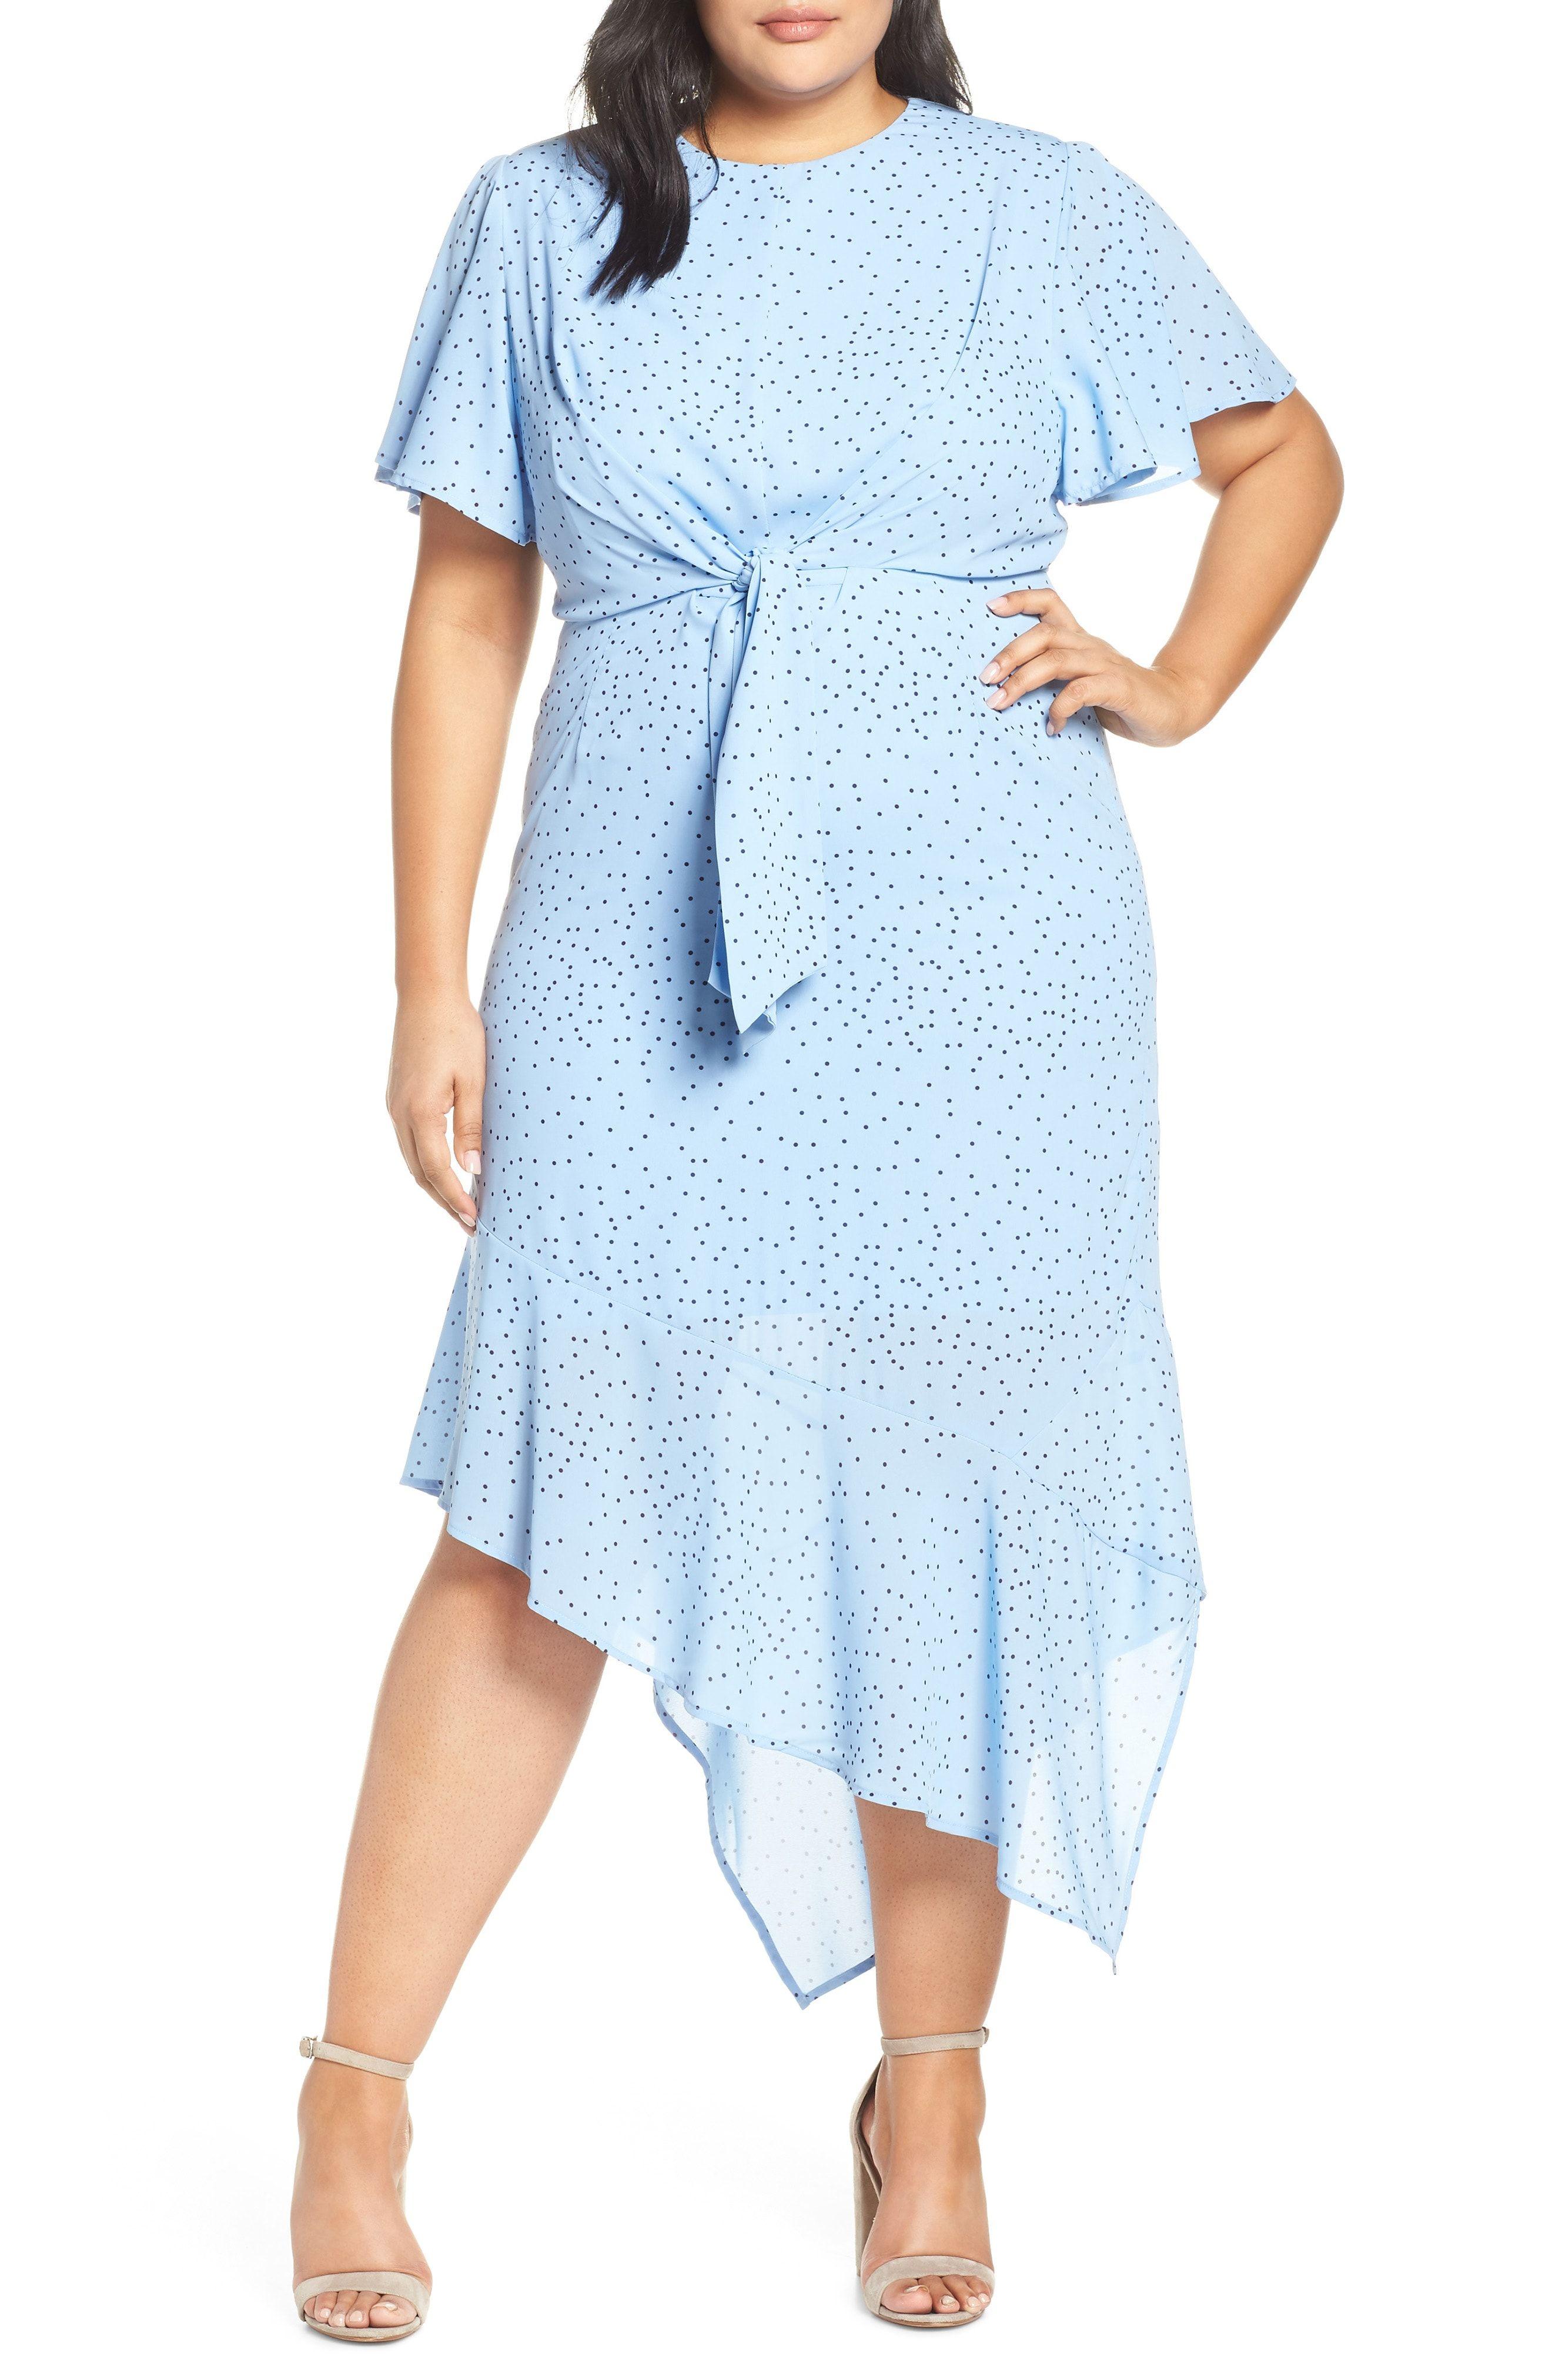 9d85dd1f088 Royal Blue Lace Dress Nordstrom